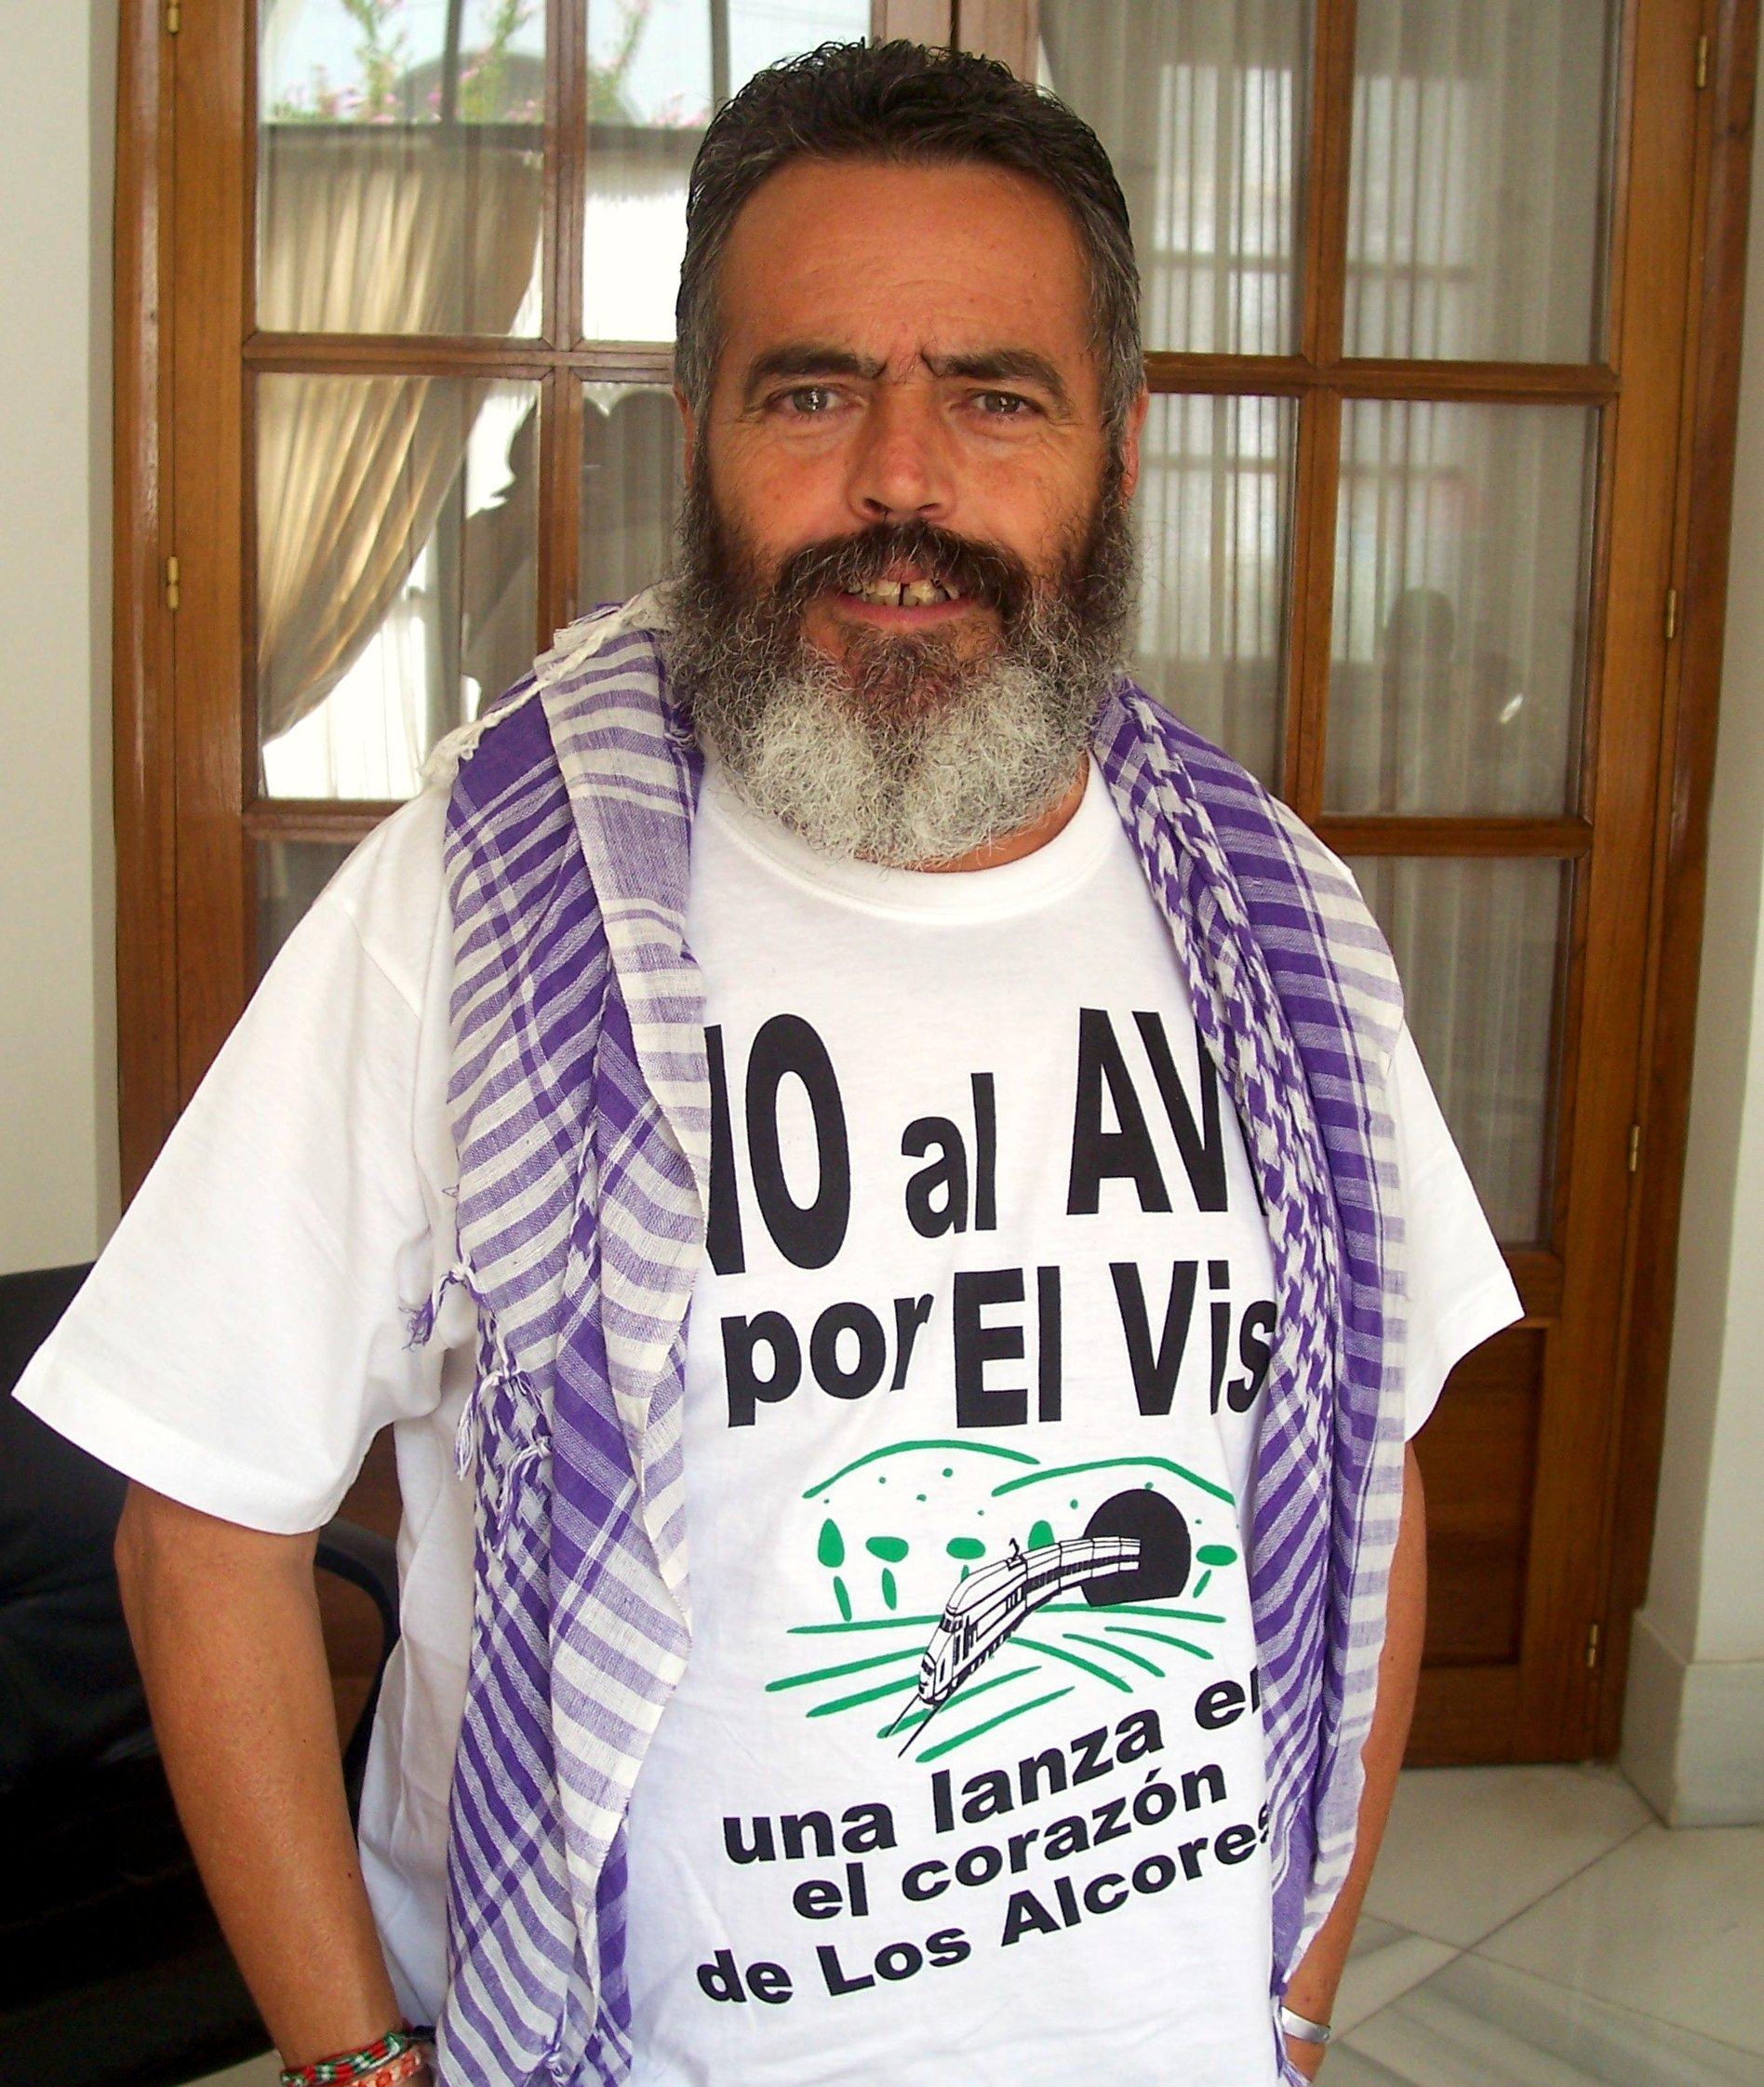 http://upload.wikimedia.org/wikipedia/commons/8/80/Juan_Manuel_S%C3%A1nchez_Gordillo.jpg